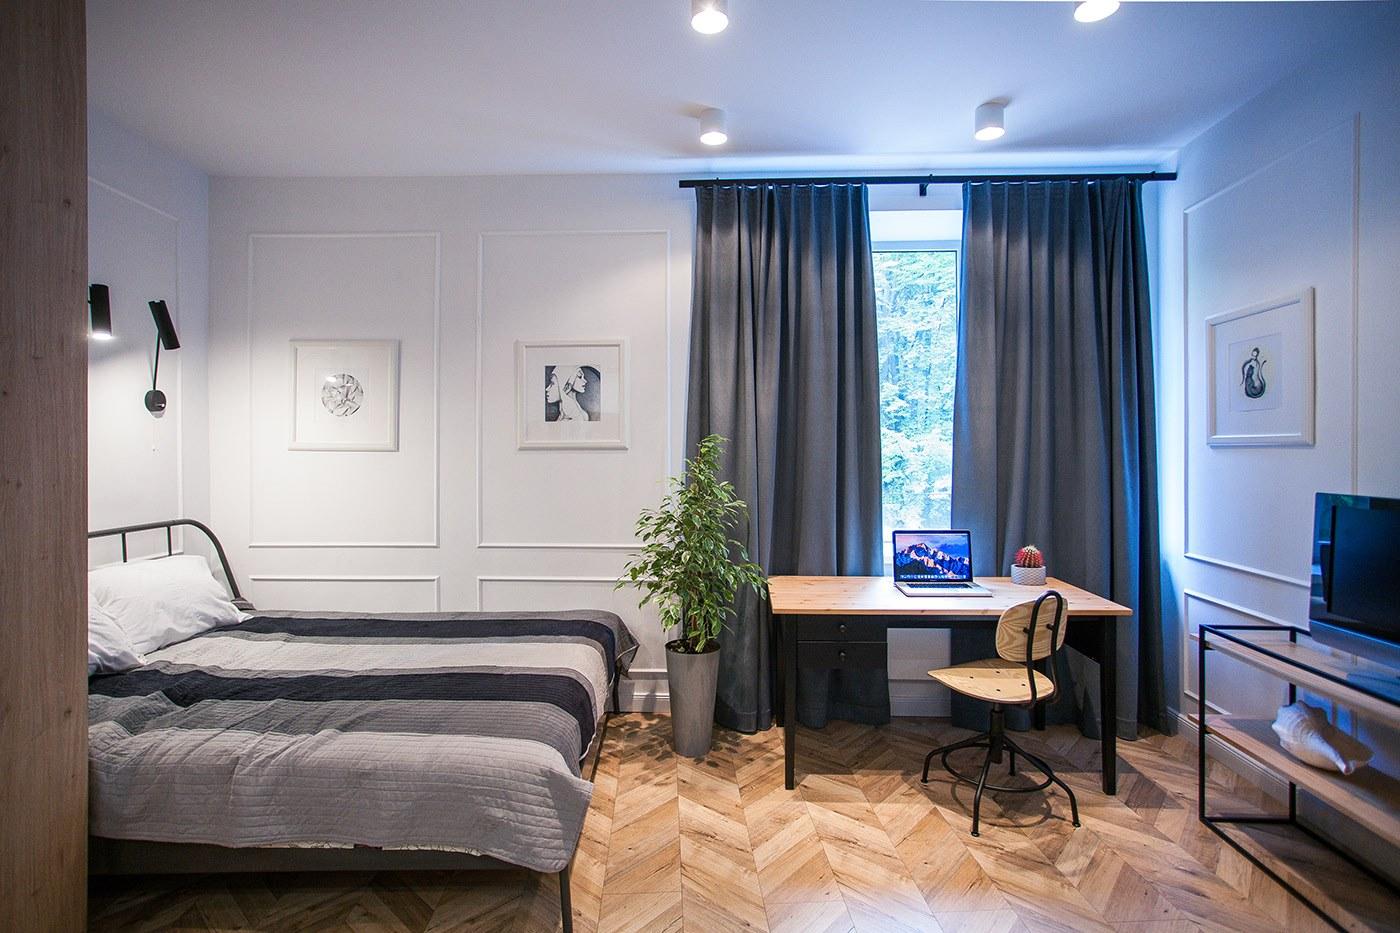 Nội thất căn hộ Studio